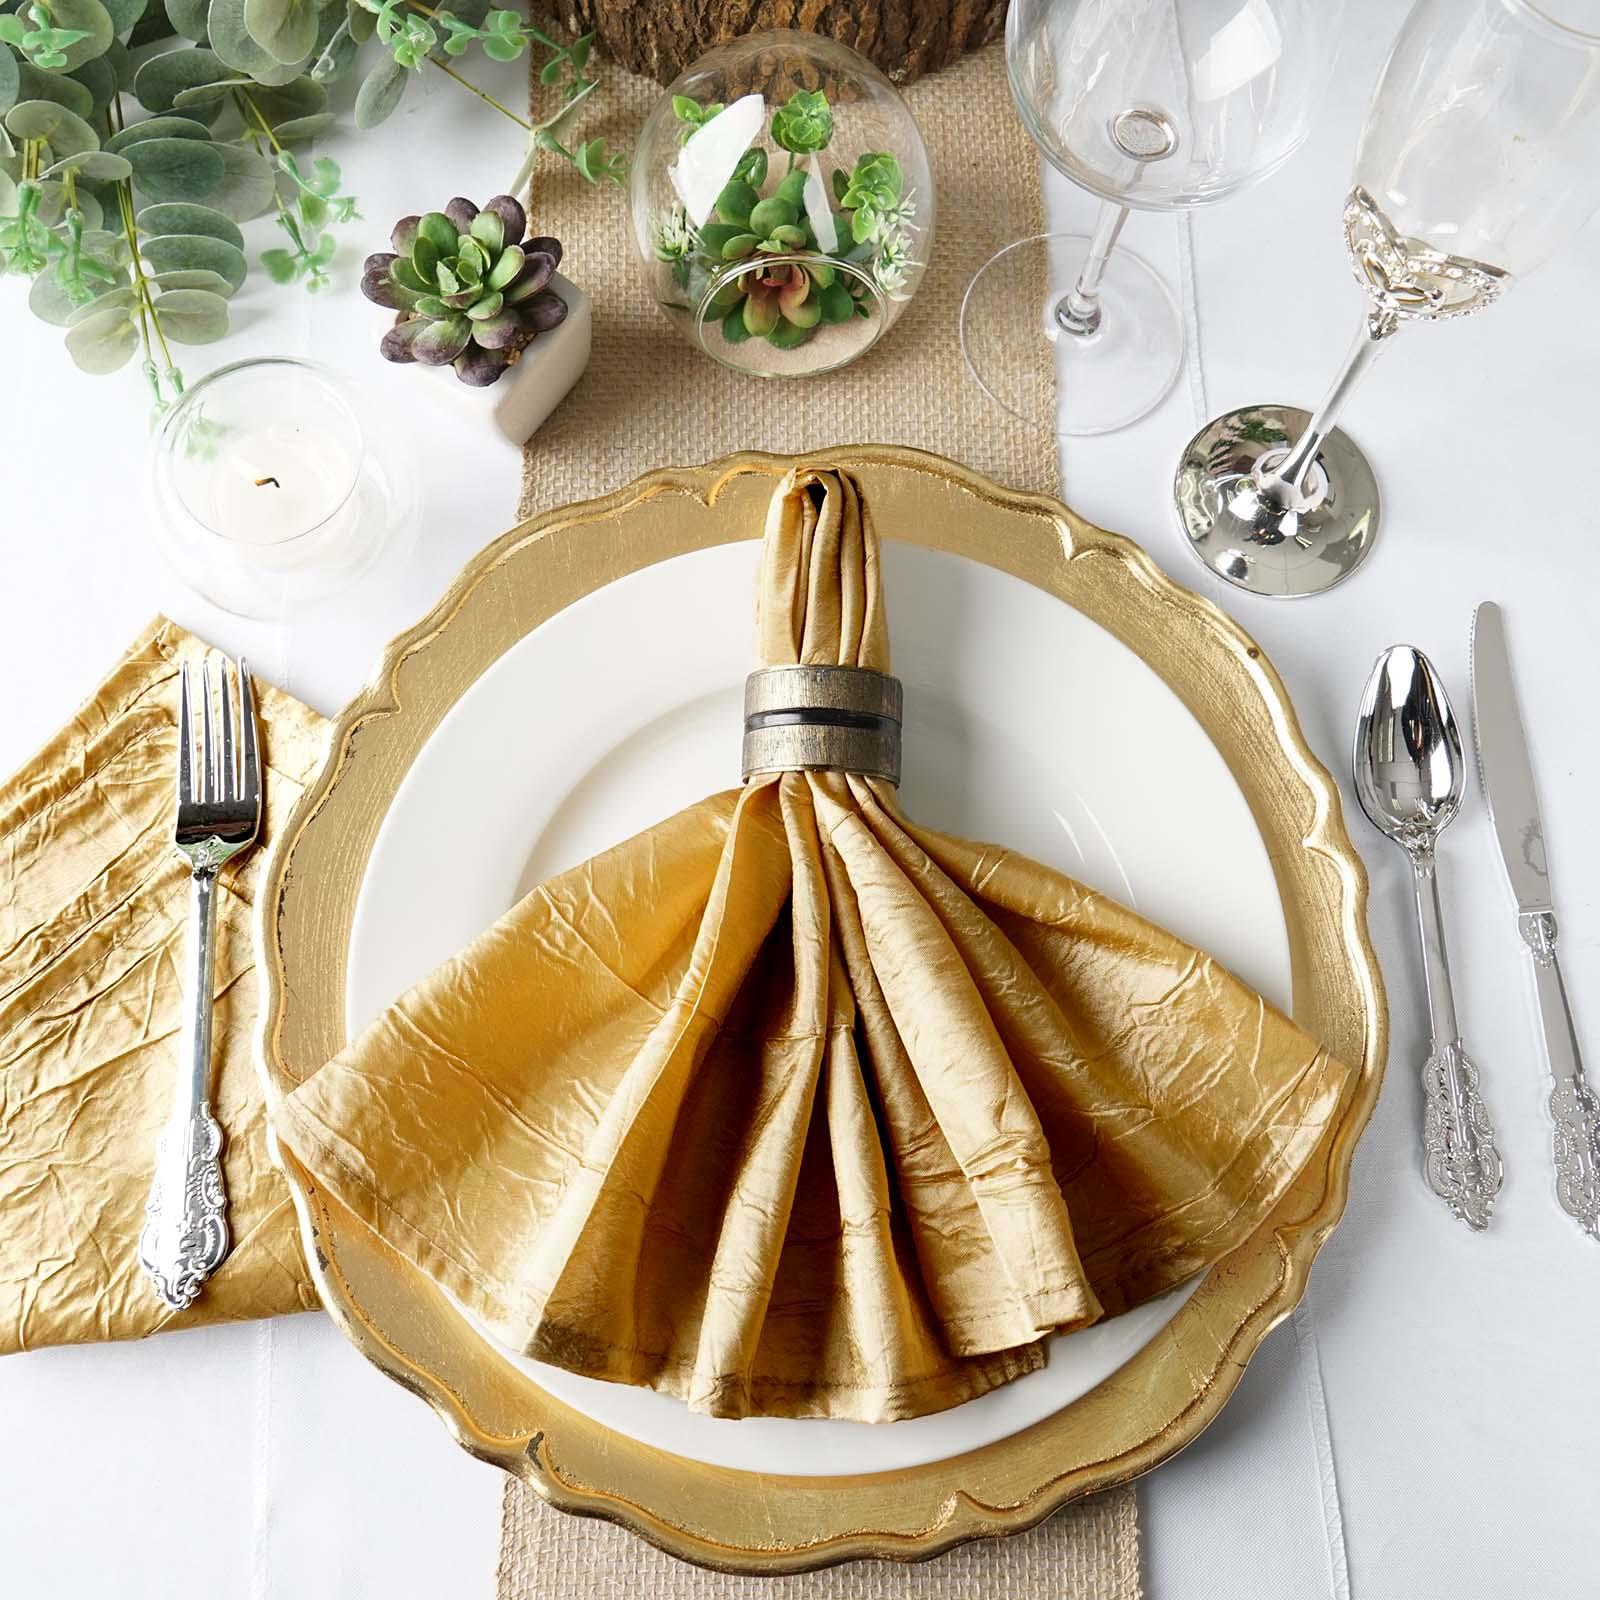 BalsaCircle 5 pcs 20 inch Taffeta Crinkle Napkins - Wedding Party Events Restaurant Dinner Kitchen Home Decorations